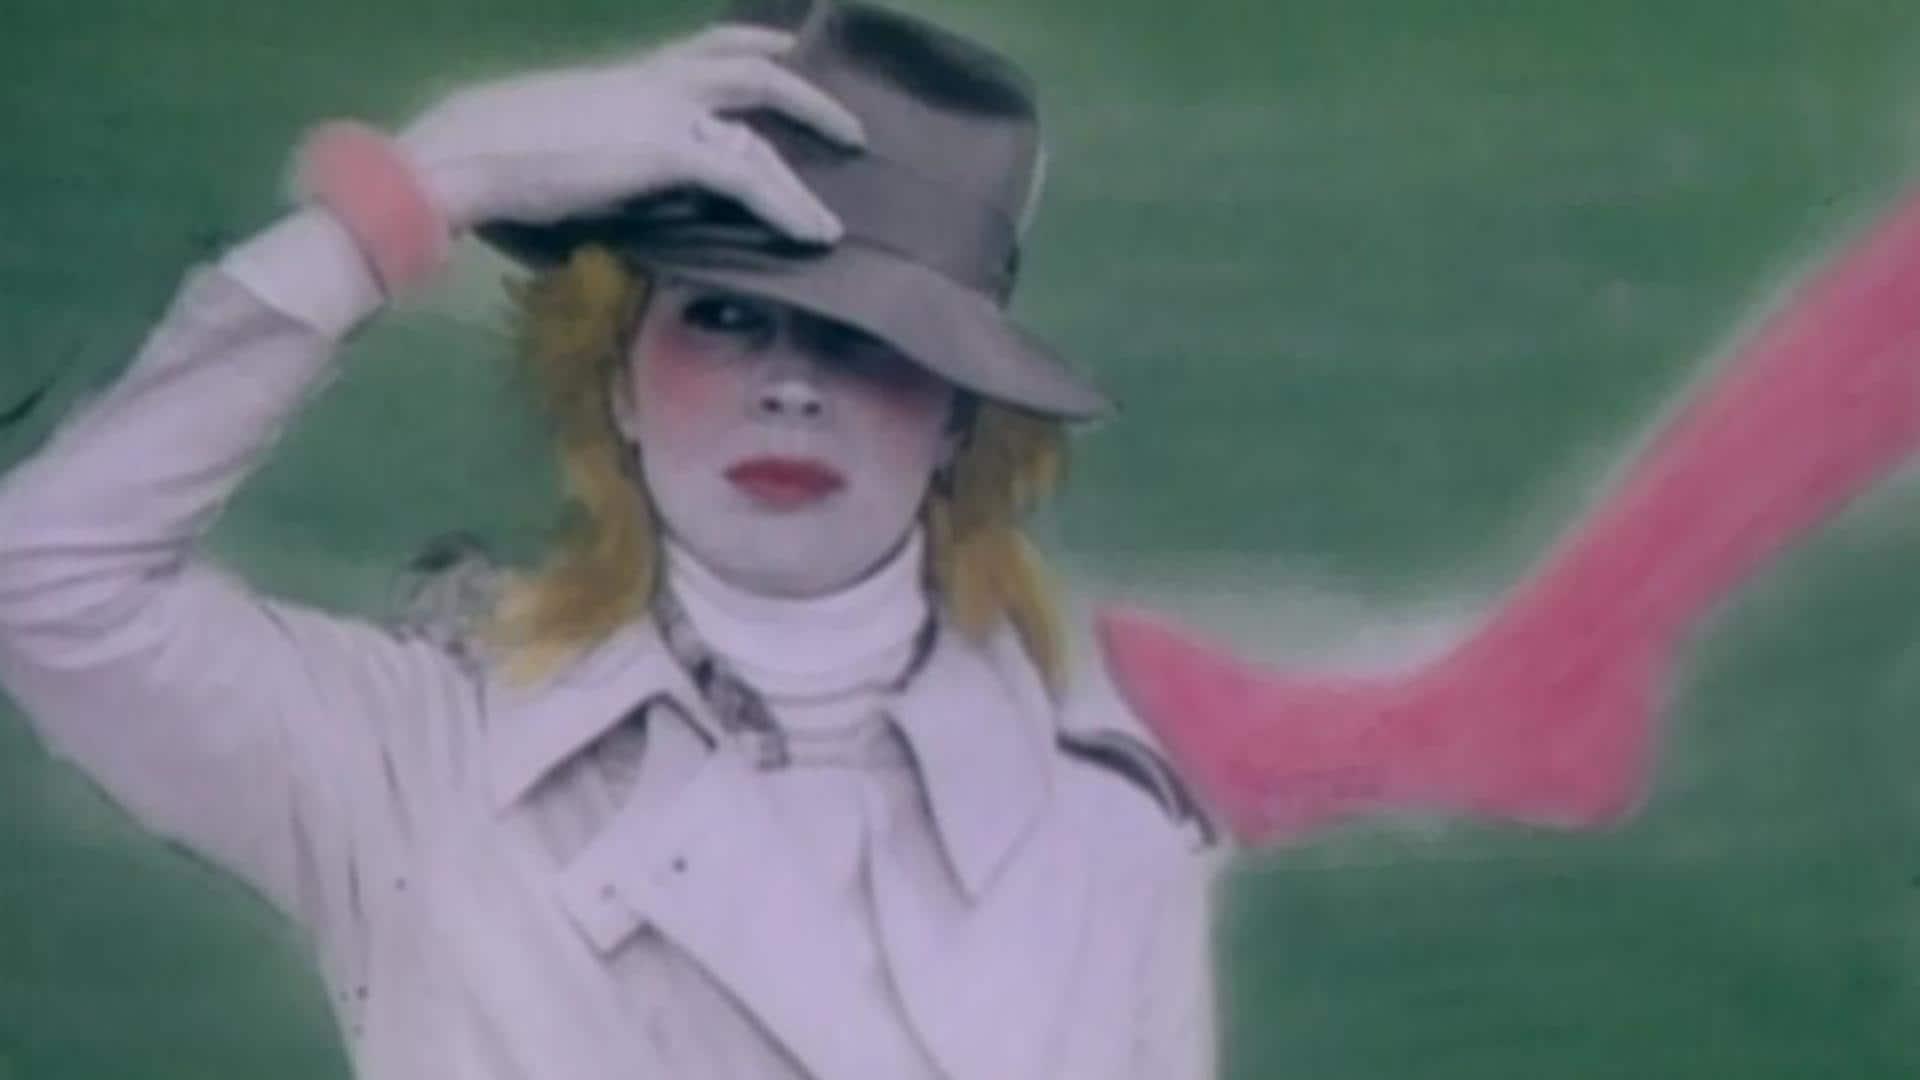 Candice Bergen: December 20, 1975